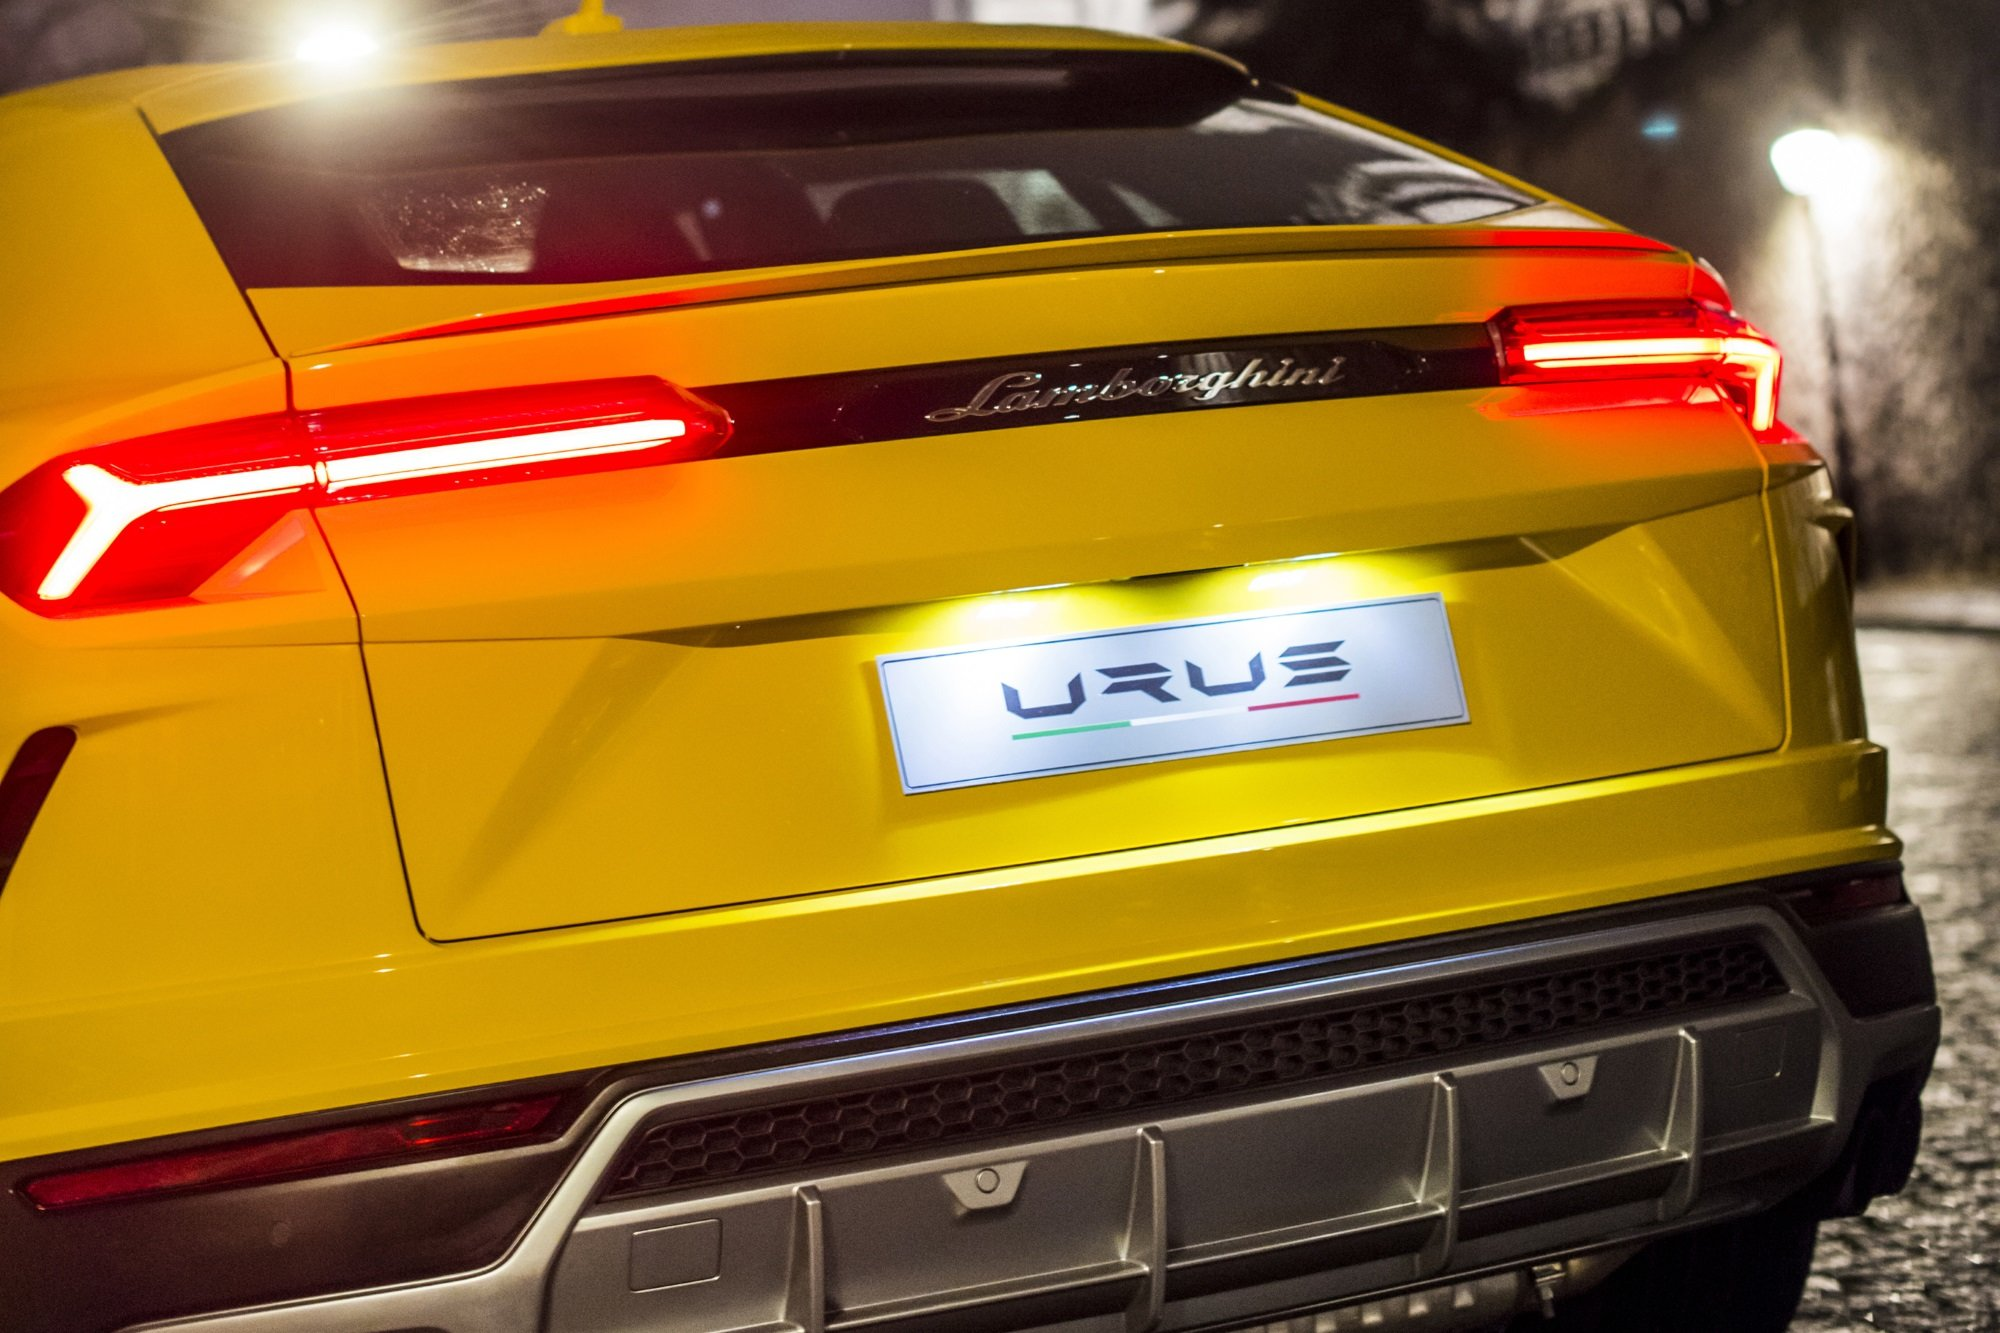 Компания Lamborghini отказалась от обвинений в отношении Aurus